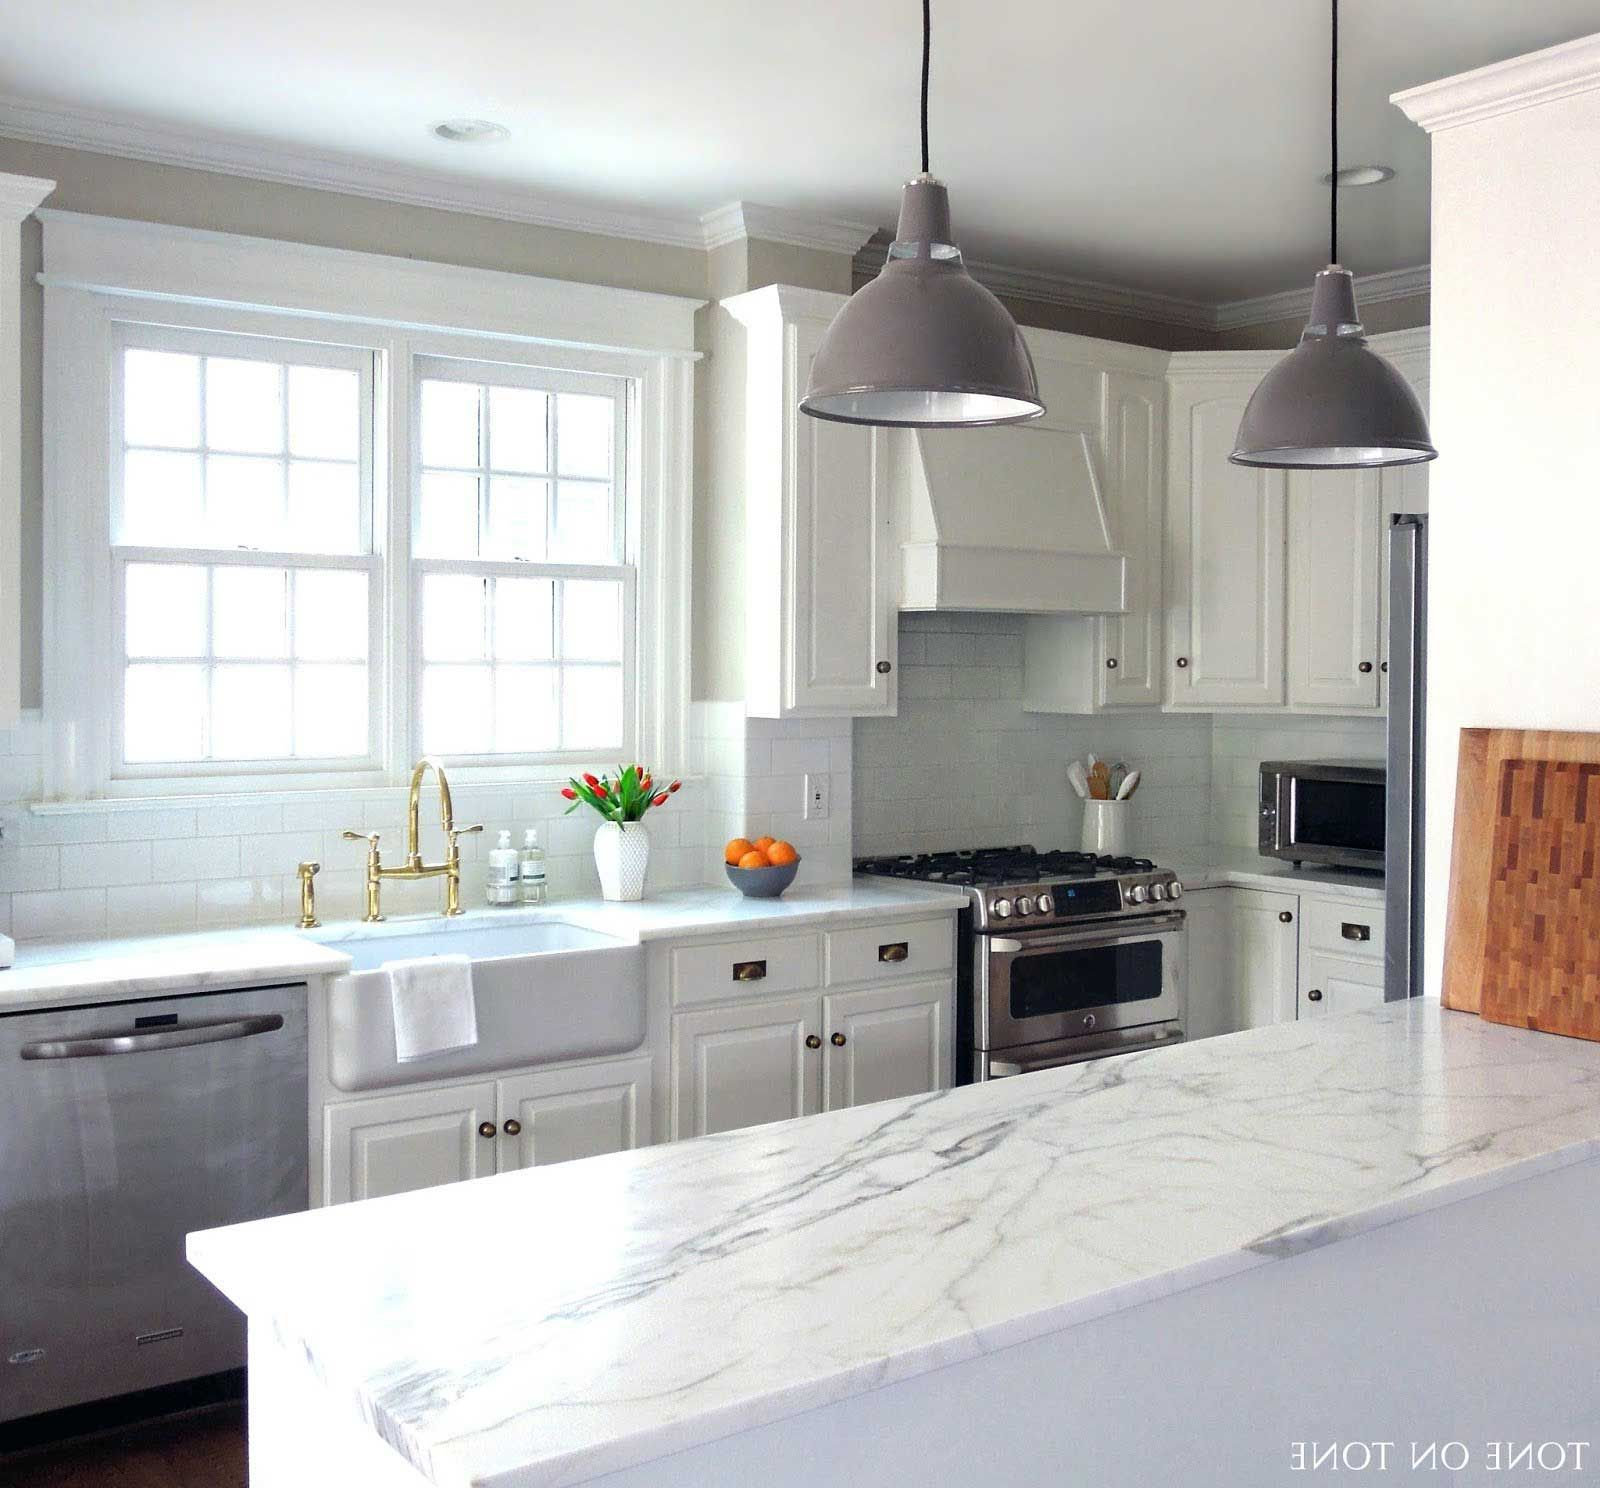 28 Fresh Kitchens Without Upper Cabinets Ideas You Can Pick Upper Cabinets Kitchens Without Upper Cabinets Fresh Kitchen